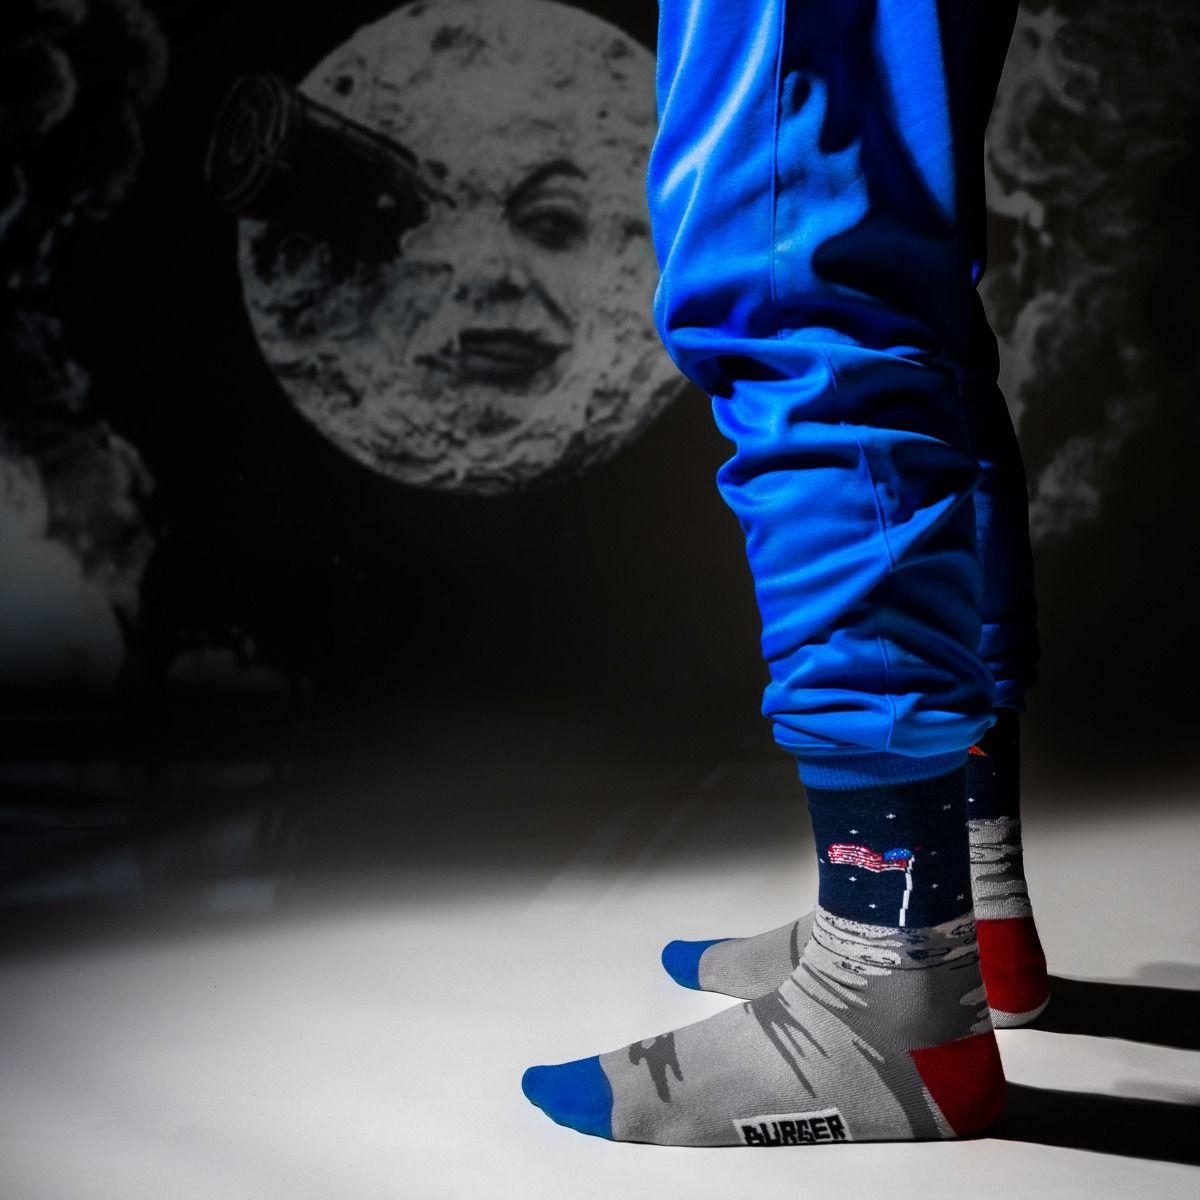 SPACE SOCKS MAN ON THE MOON